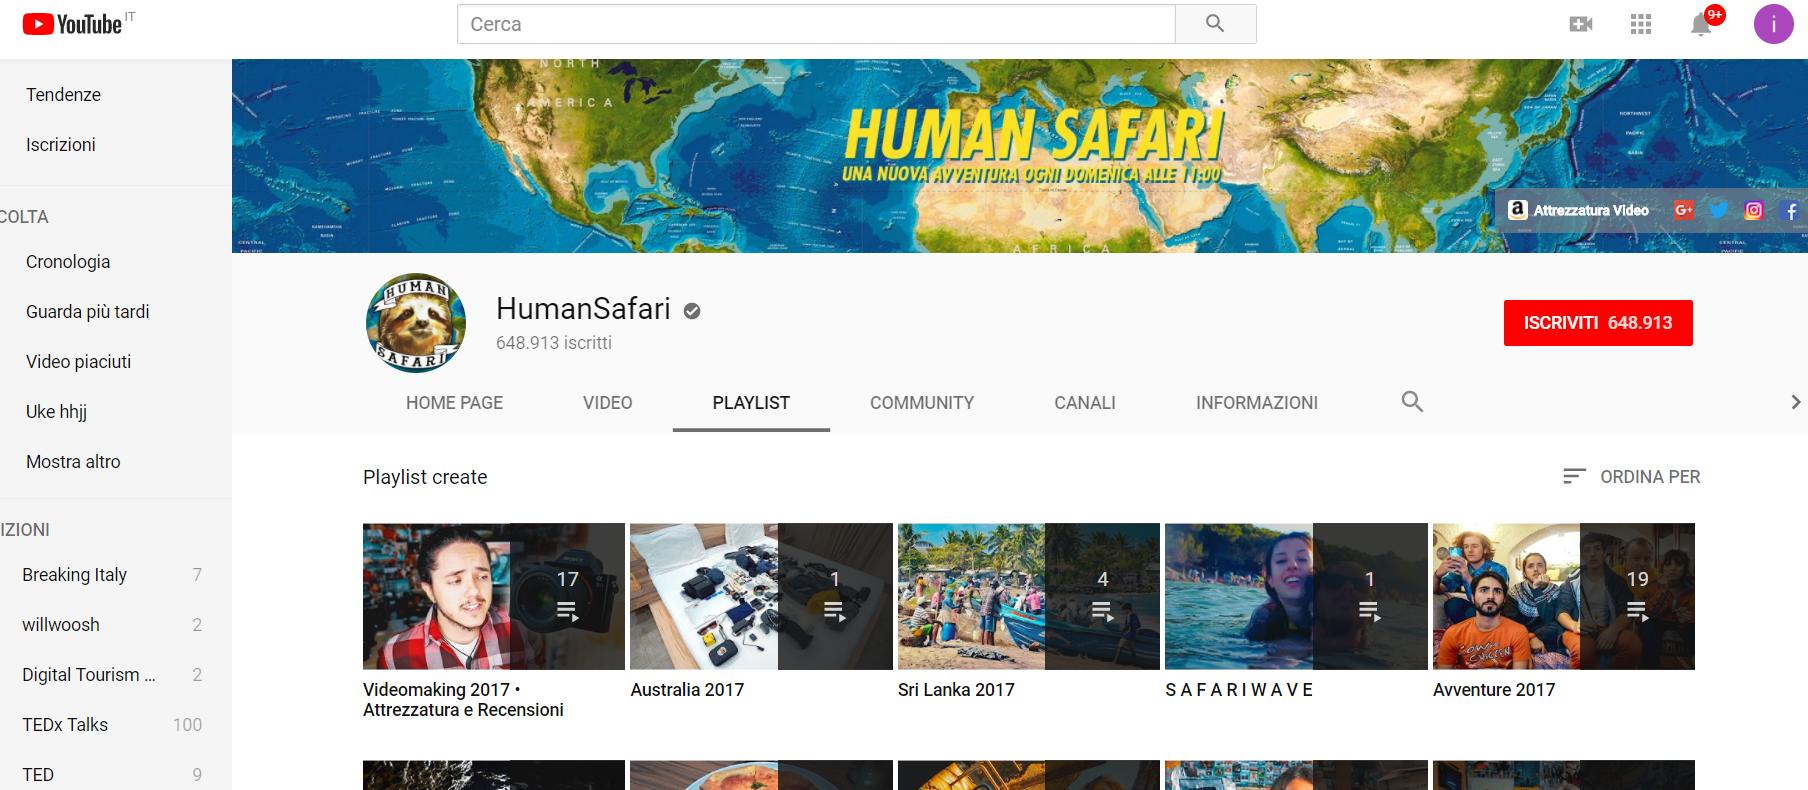 influencer marketing travel blog turismo_ Human Safari_ distribuzione travel blogger